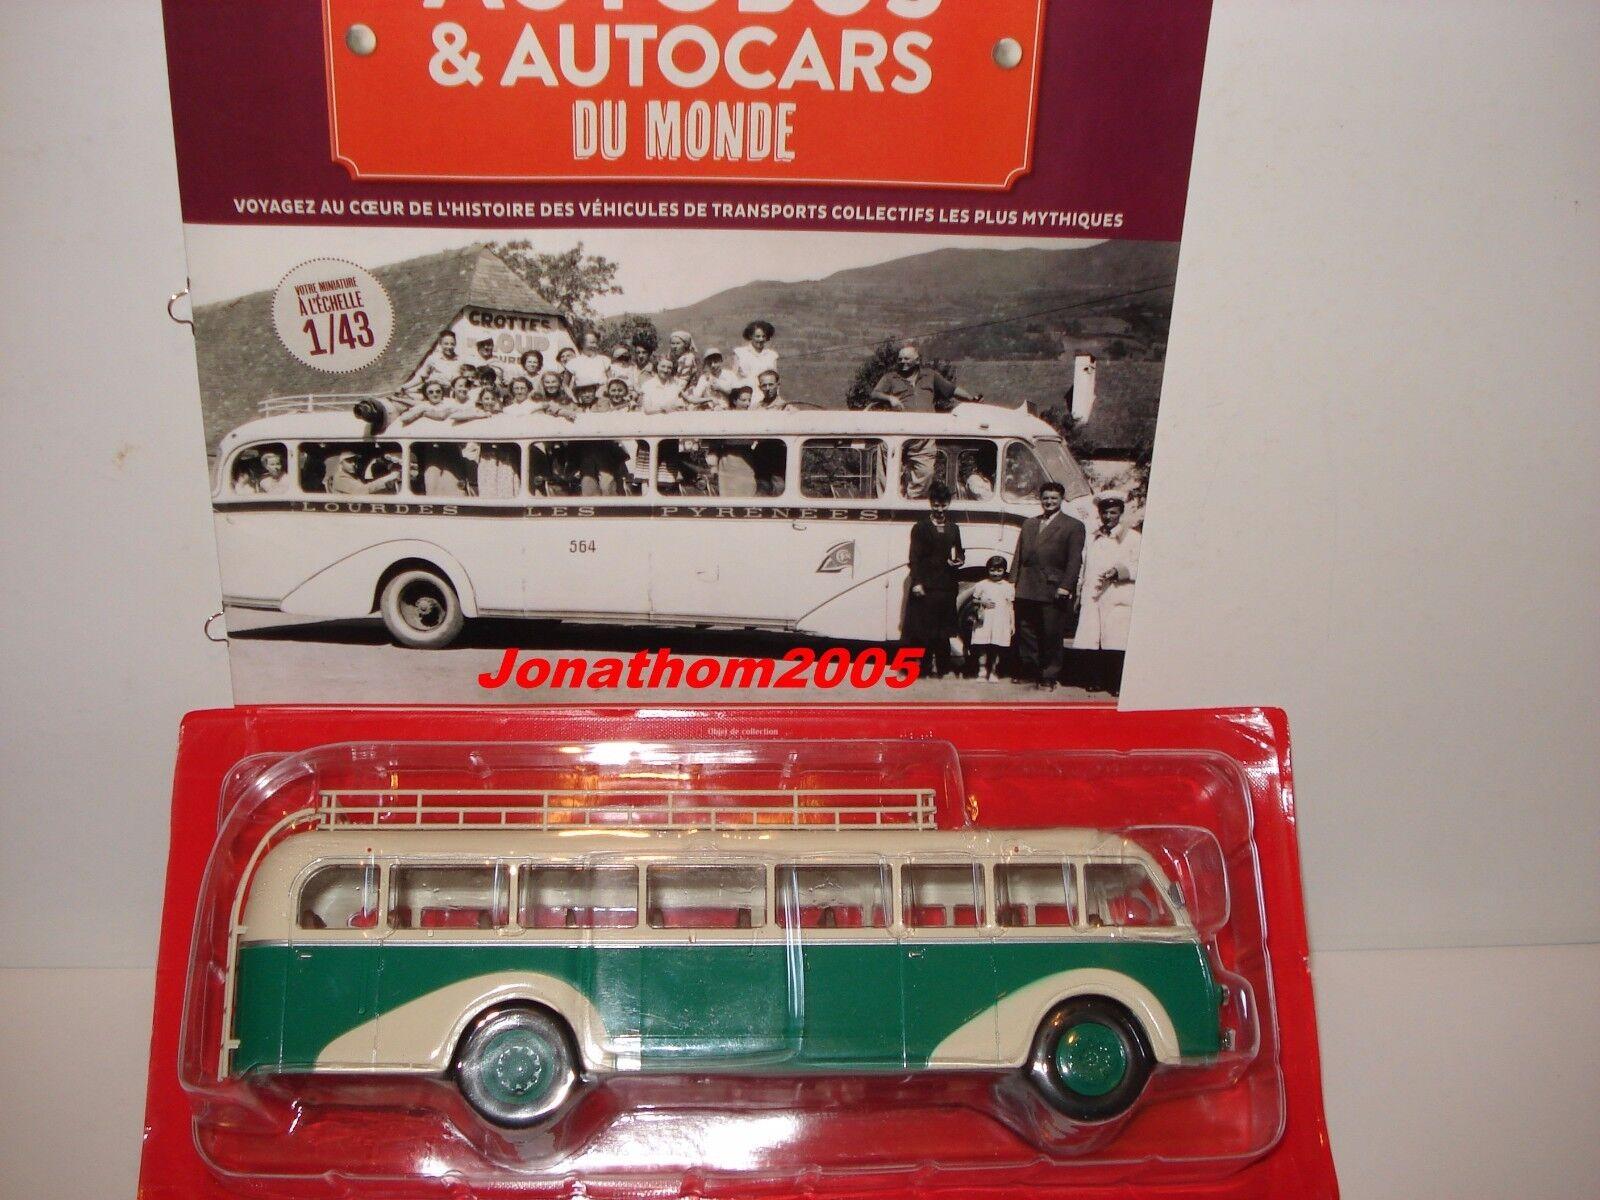 AUTOBUS & AUTOCARS DU MONDE - PANHARD MOVIC MOVIC MOVIC IE 24 FRANCE 1948 au 1 43° cf3461